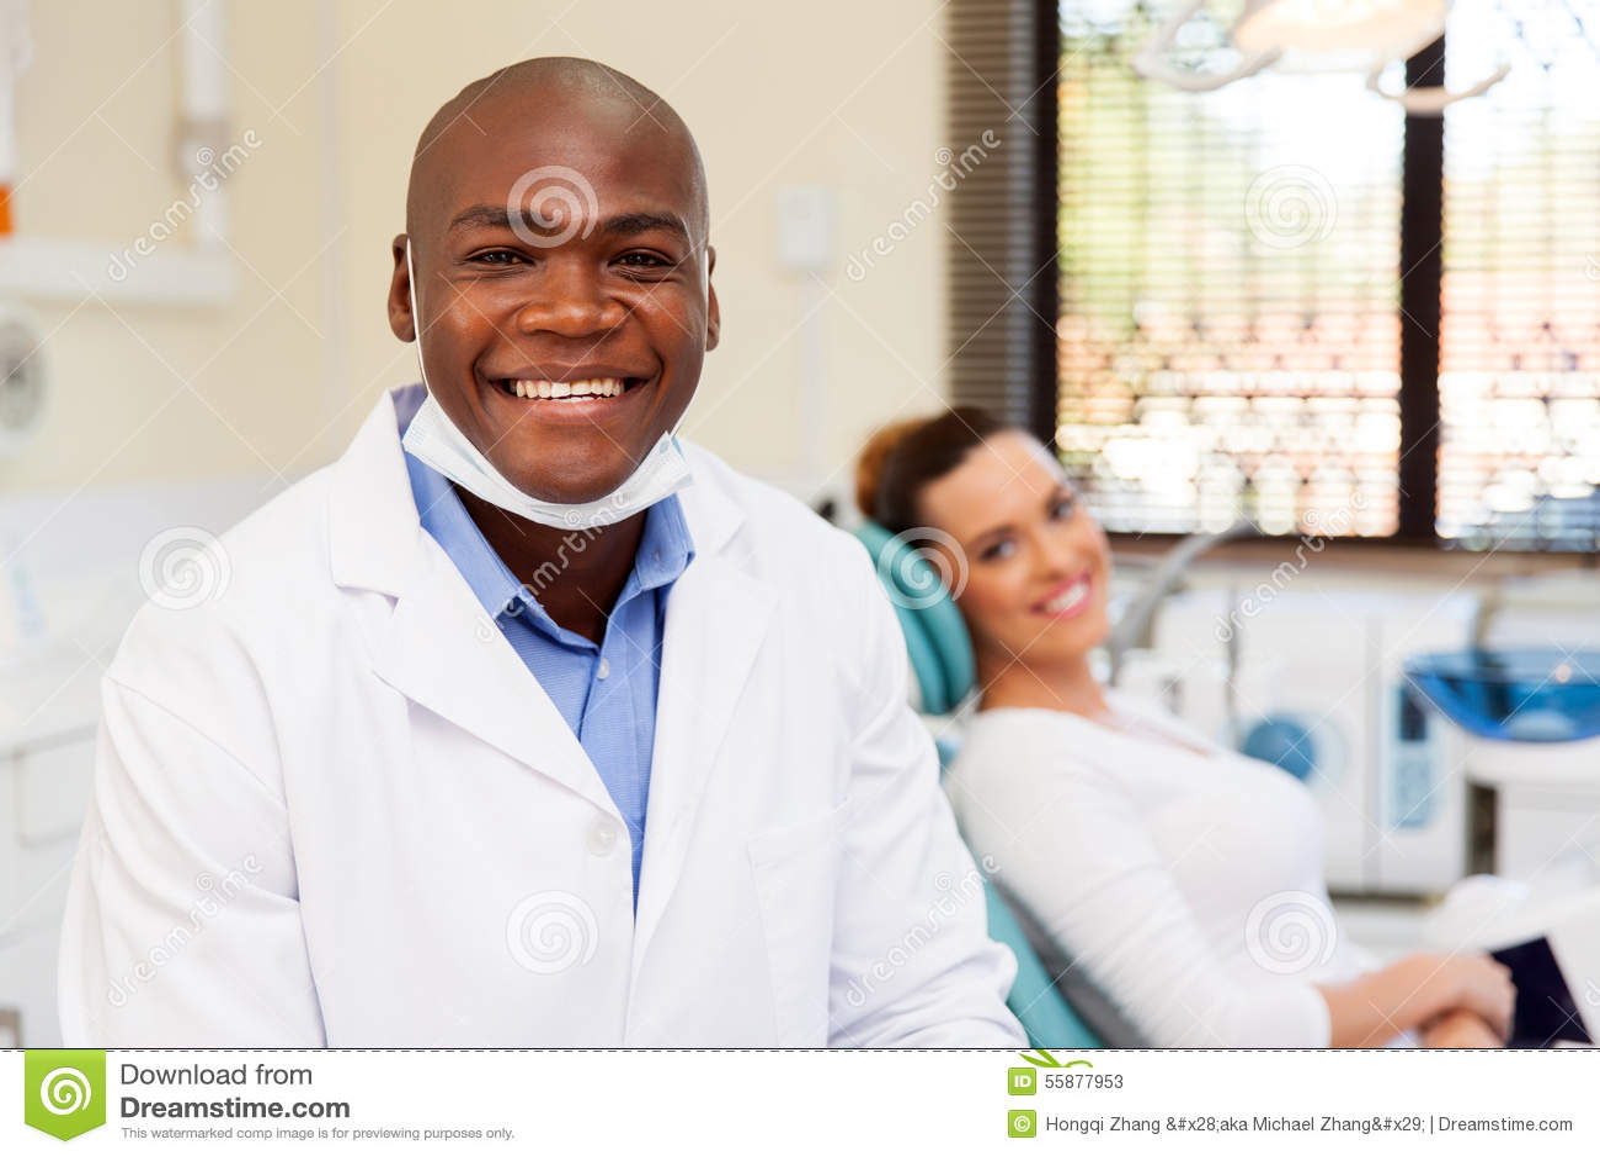 africano doctor sexo